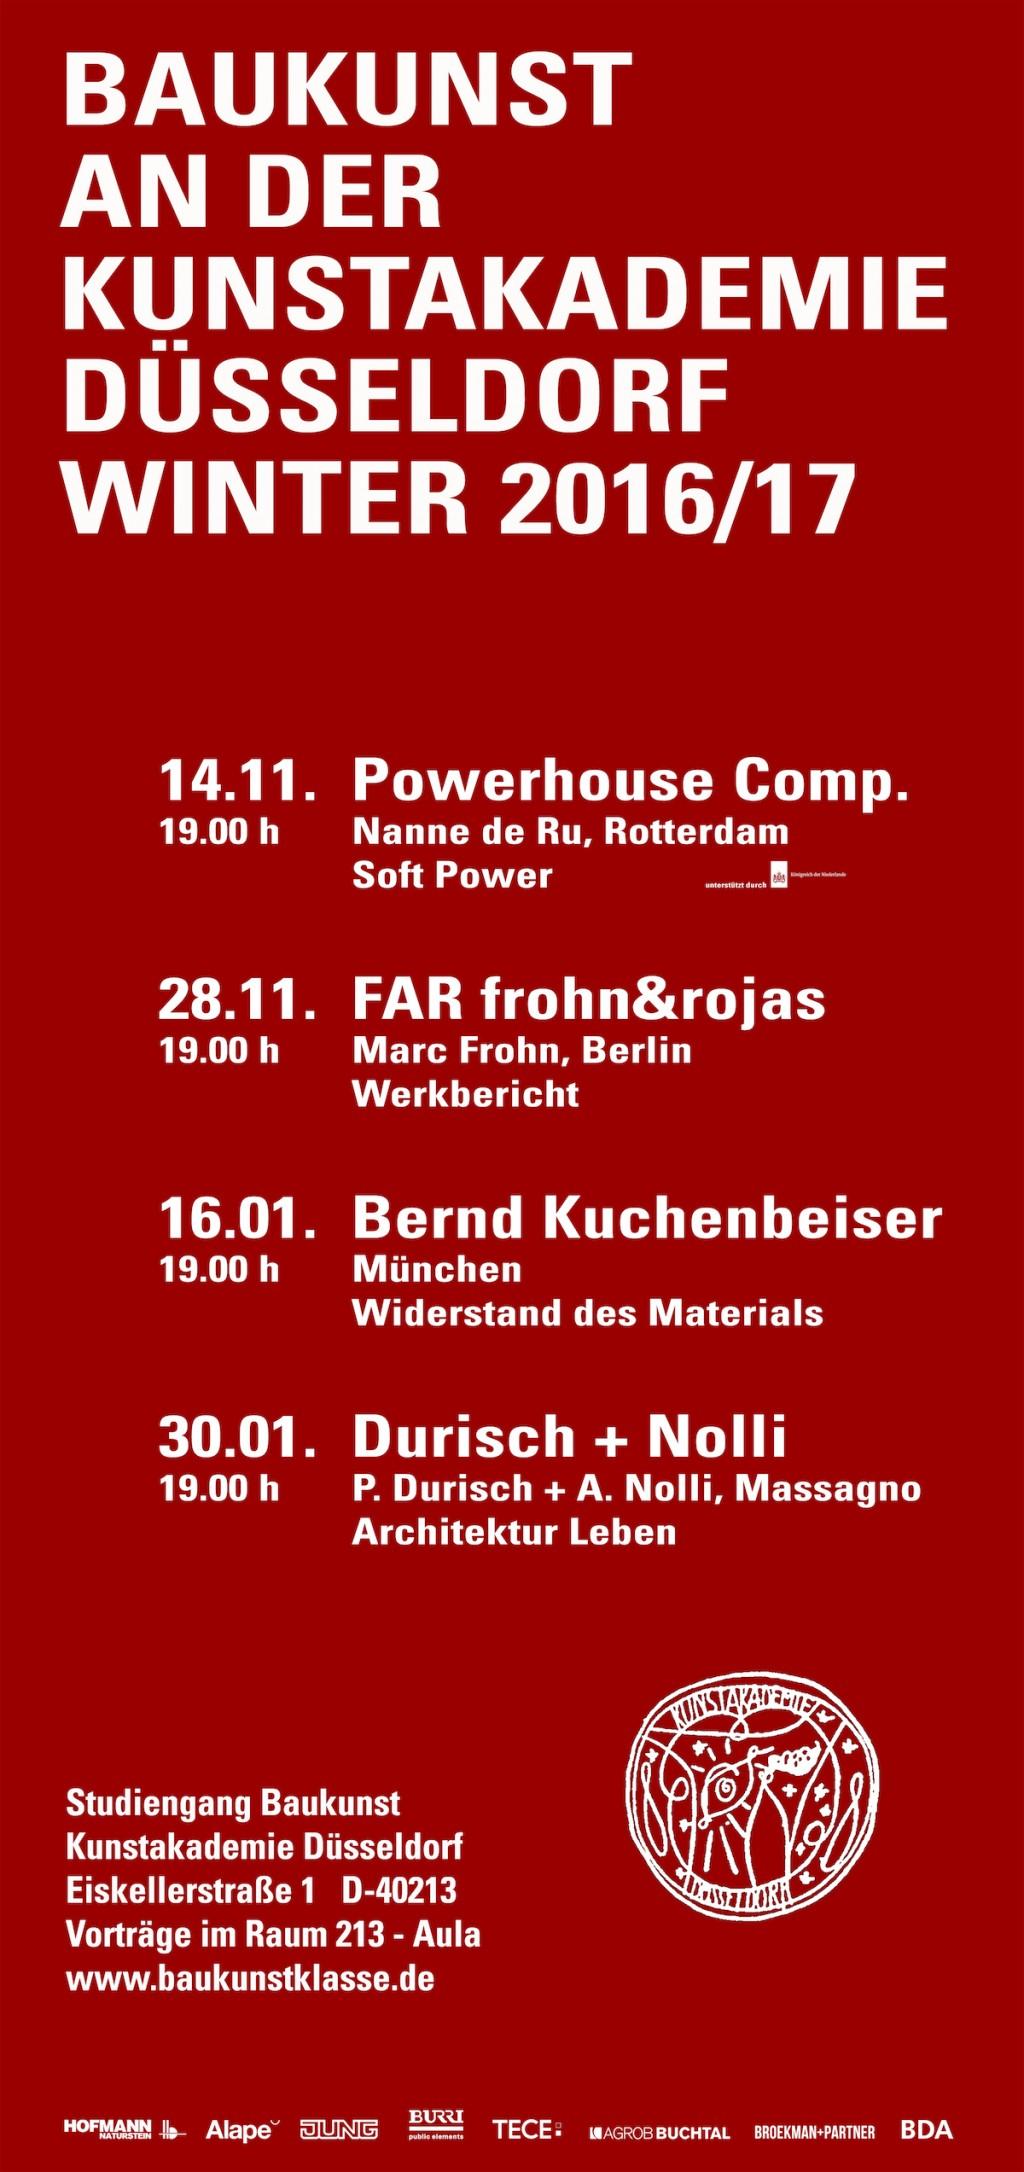 Broekman+Partner Baukunst Kunstakademie Düsseldorf Wintersemester 2016/17